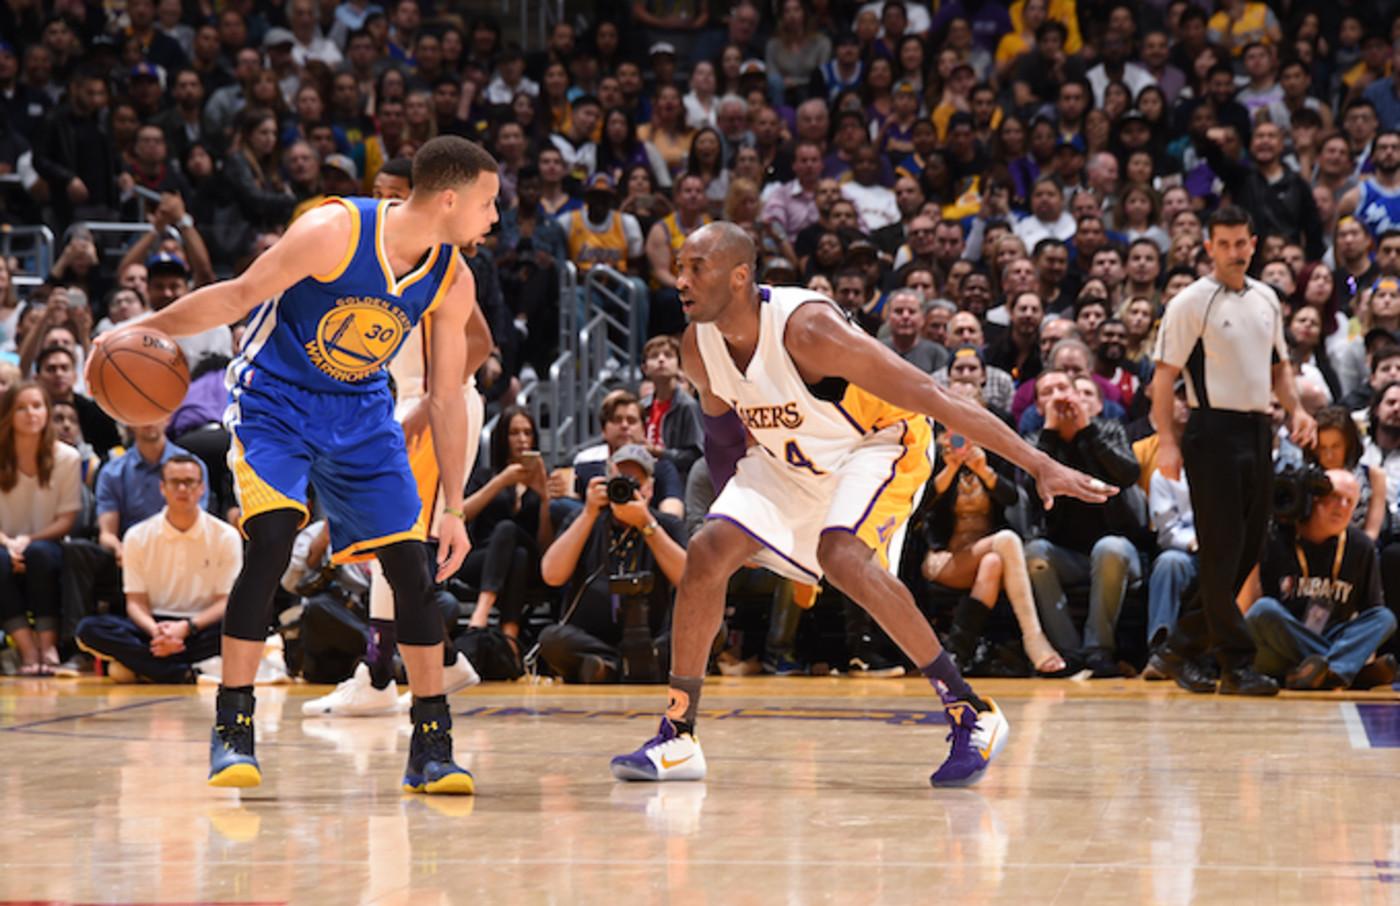 Steph Curry, Kobe Bryant